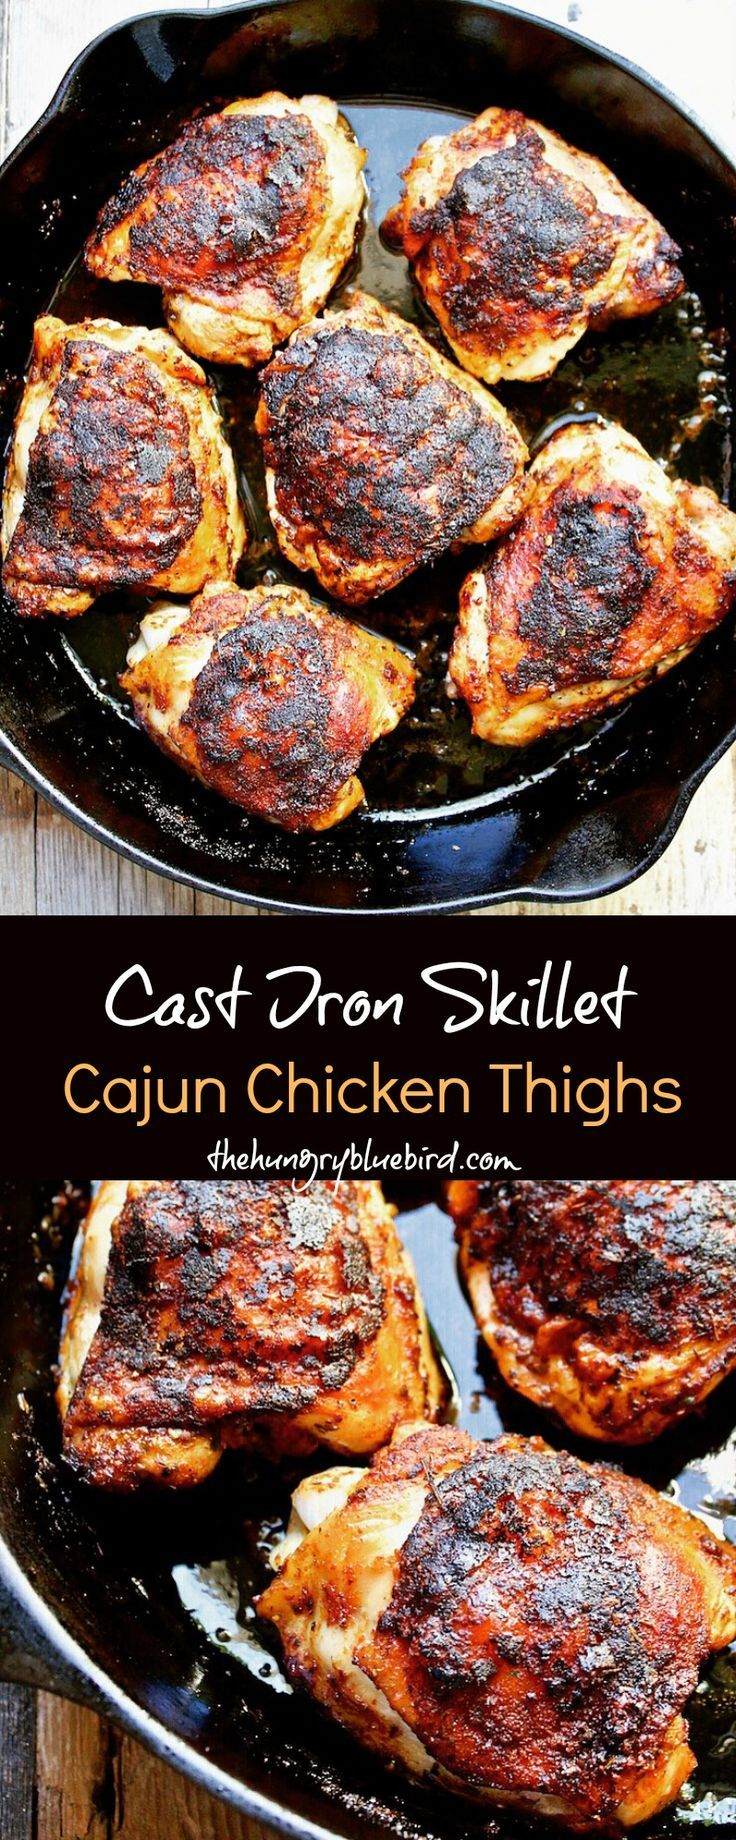 Cast Iron Skillet Cajun Chicken Thighs ~ one skillet, one spice.